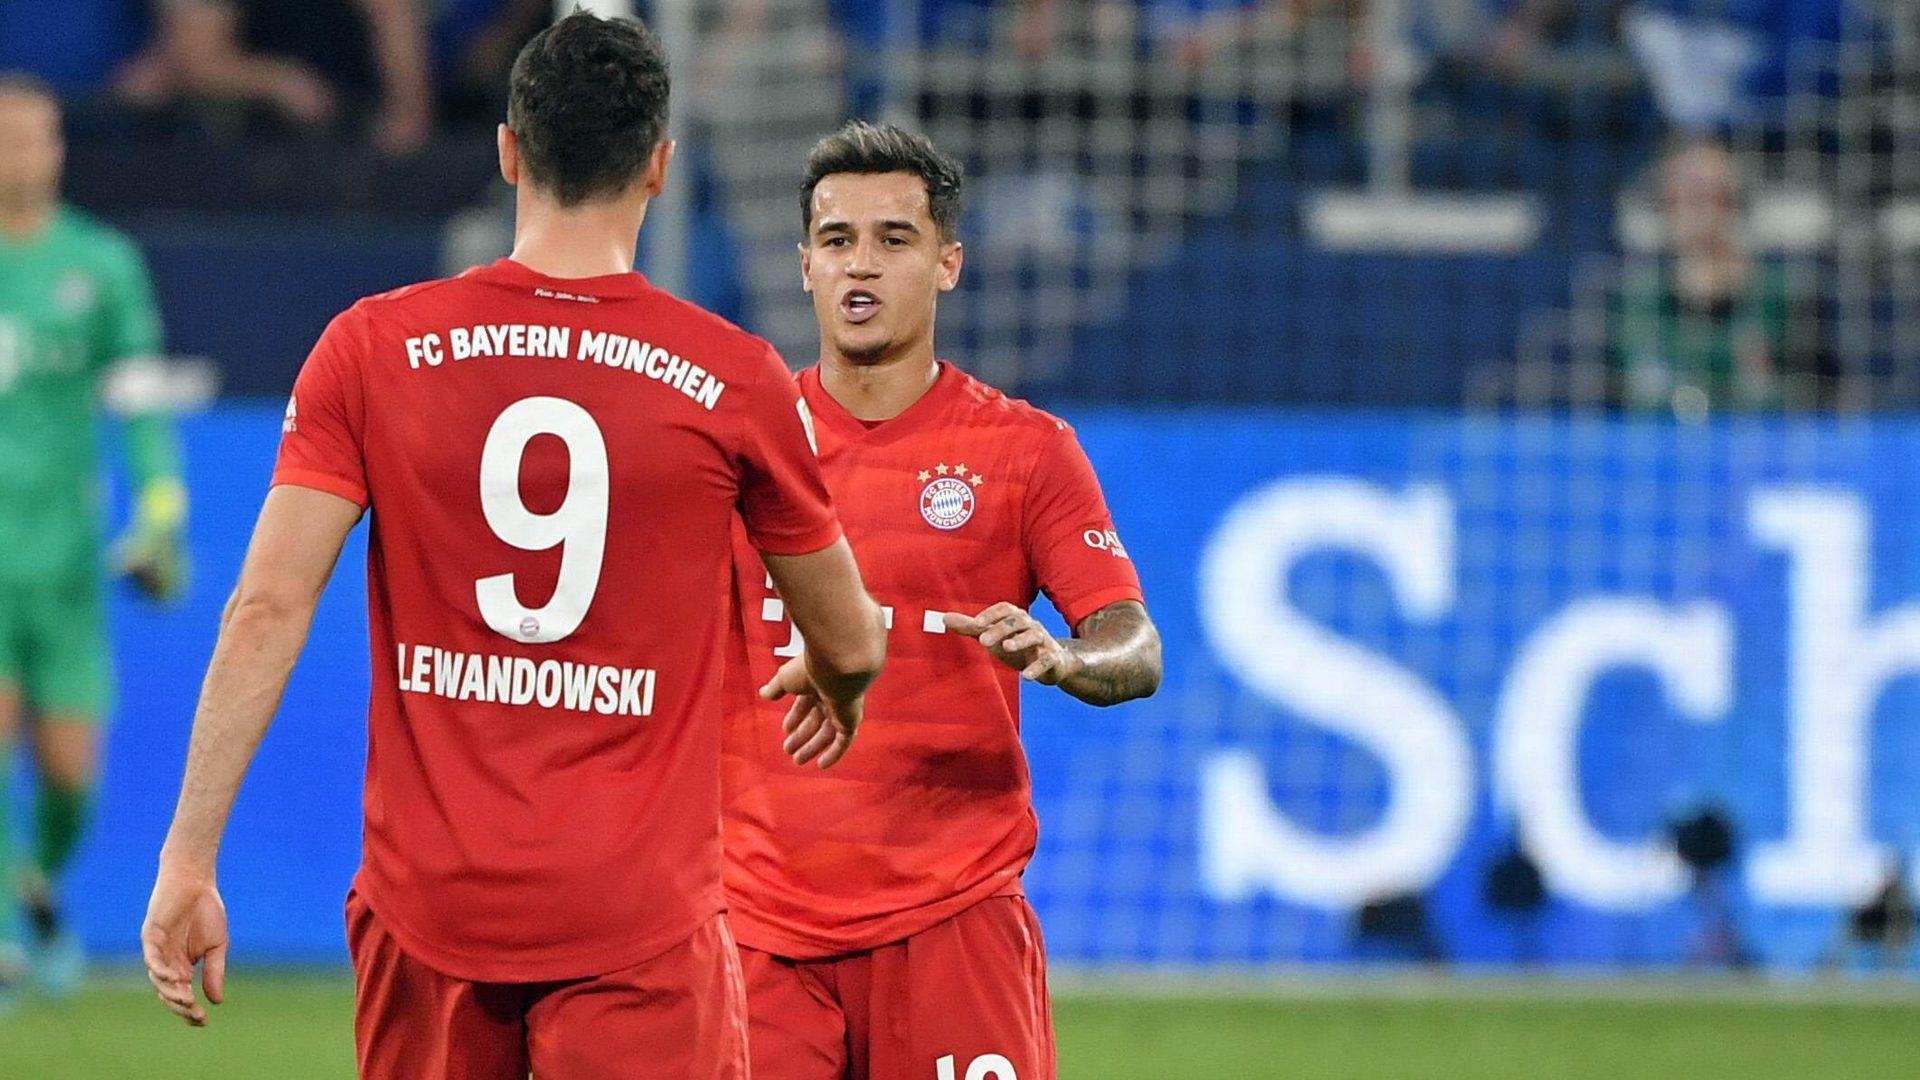 Blue FC Bayern Munich | adidas US